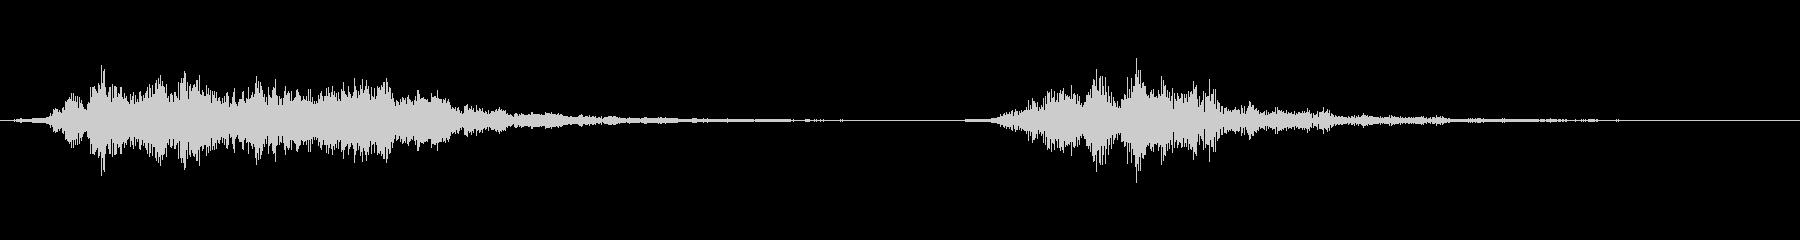 【SE 効果音】不気味な音13の未再生の波形